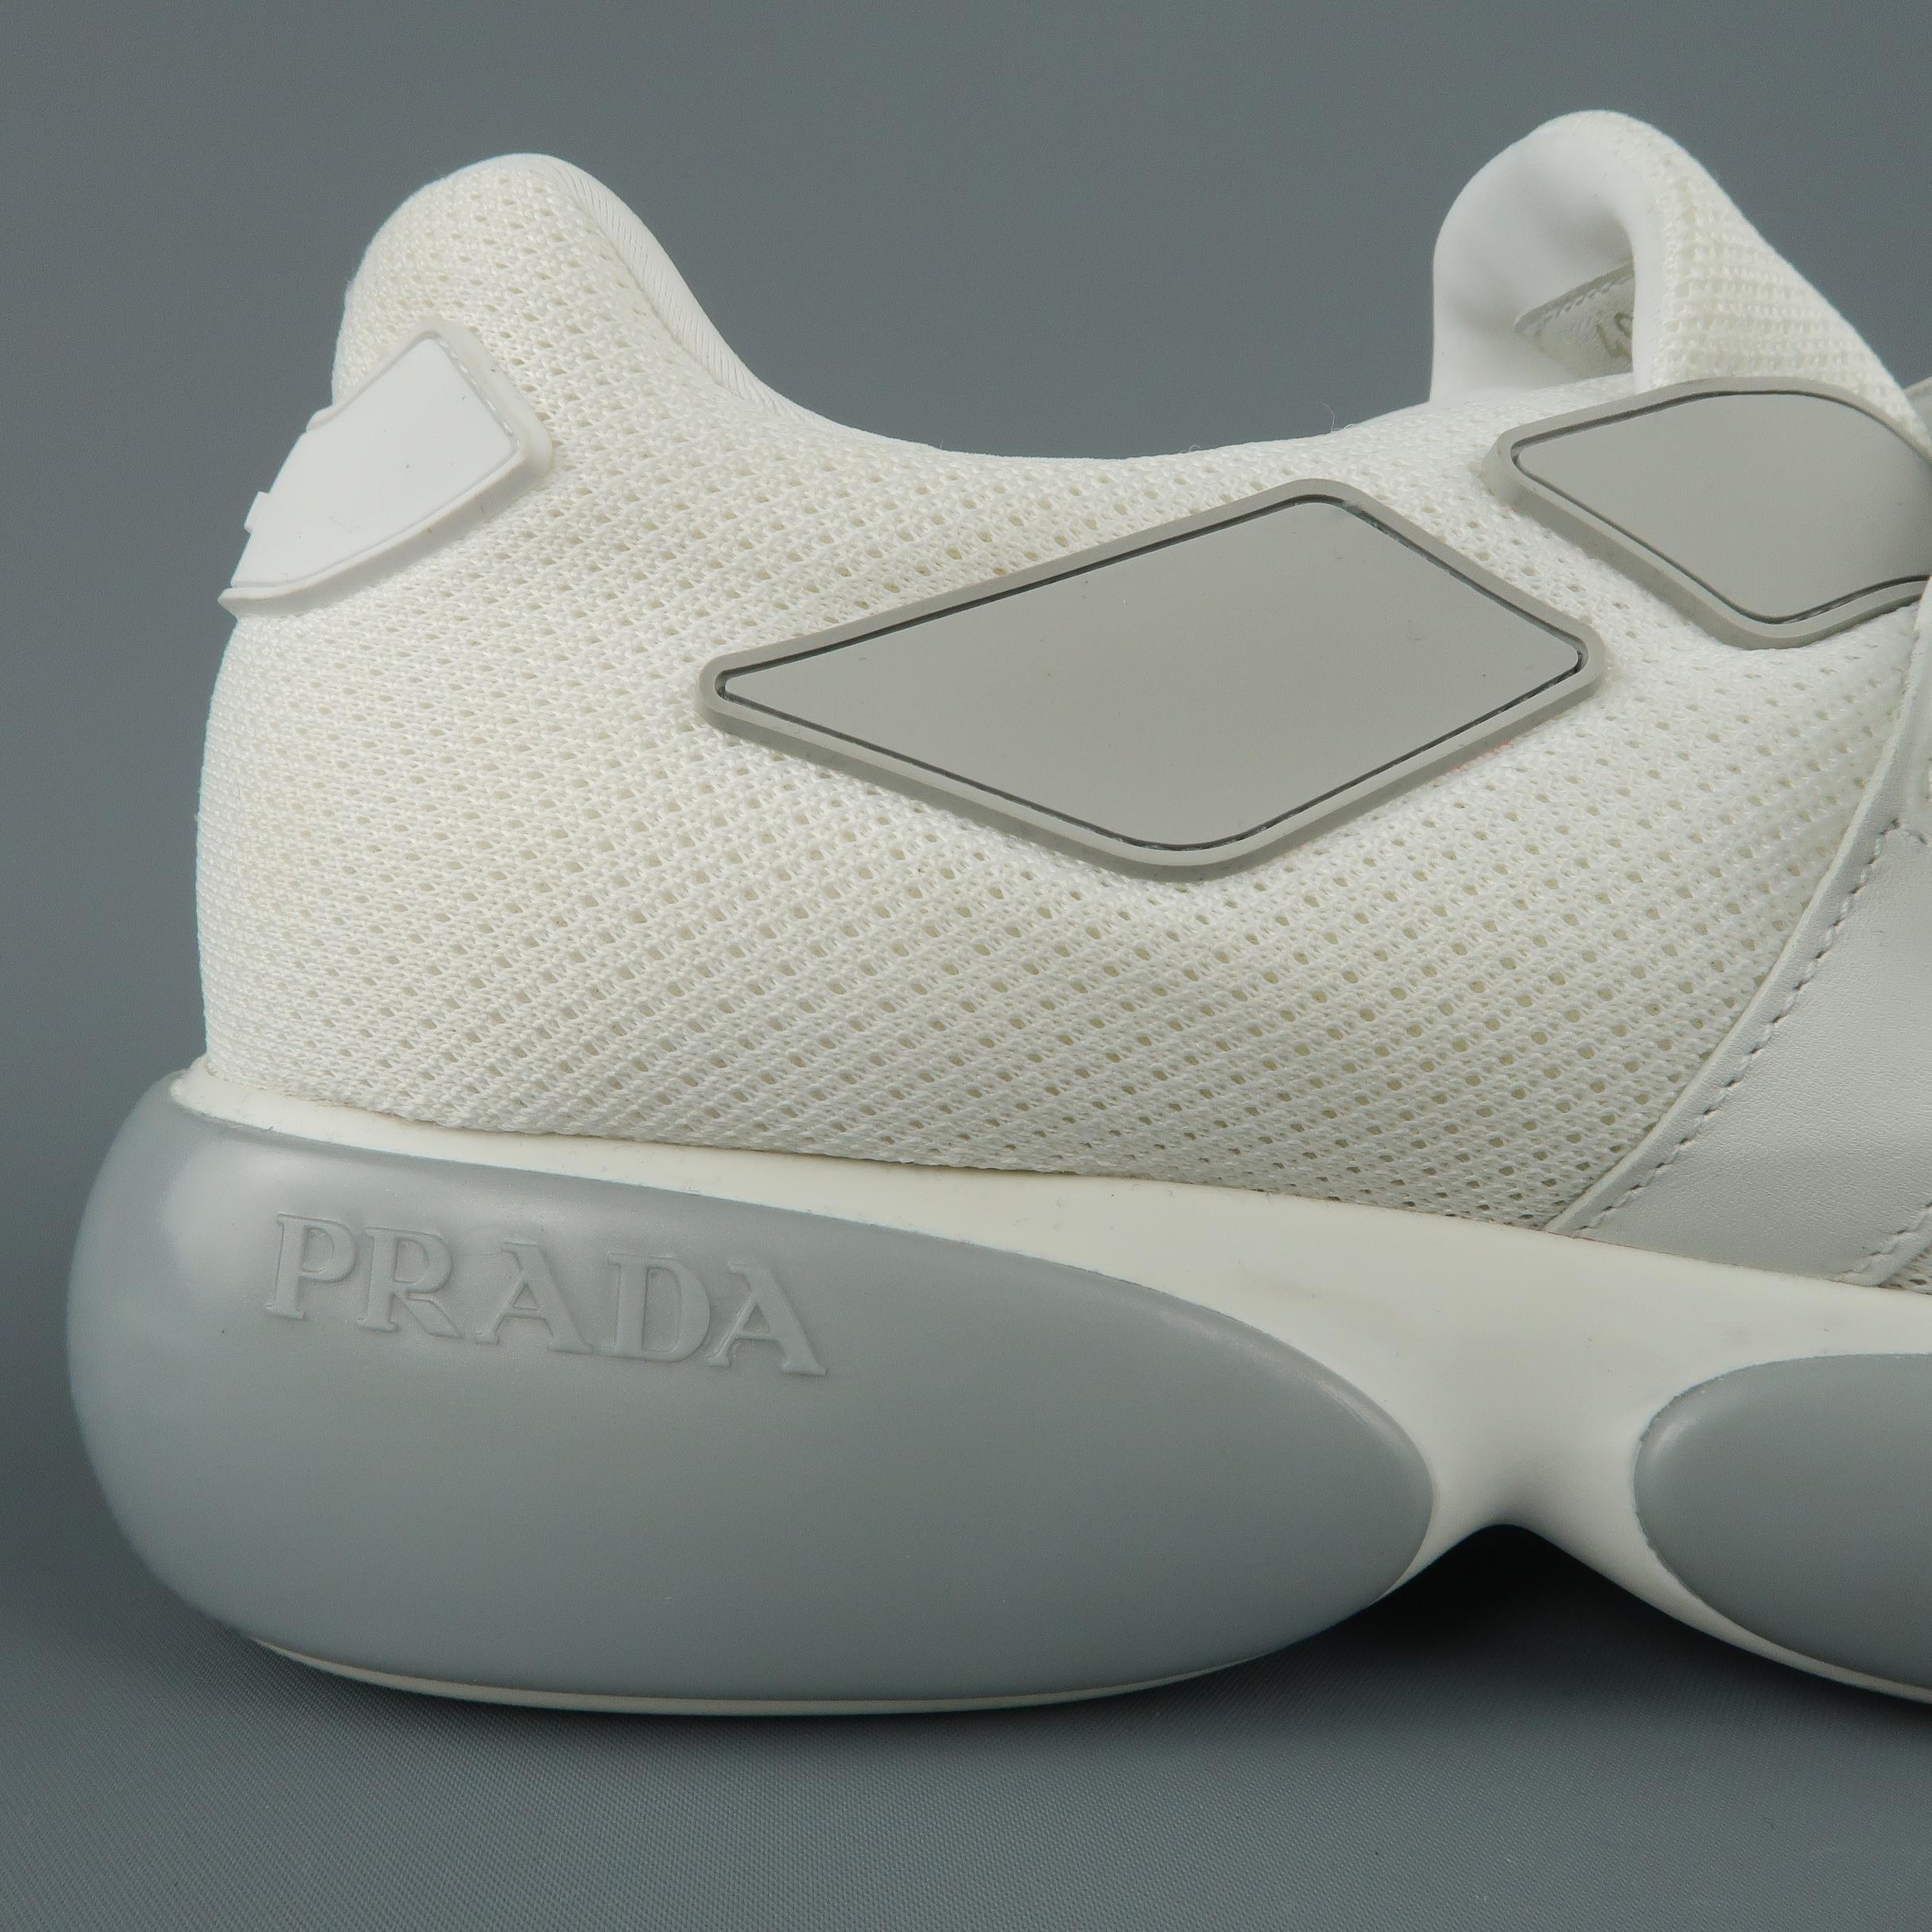 b967ab80 new zealand pradas cloudbust sneaker gets dipped in bright green ...